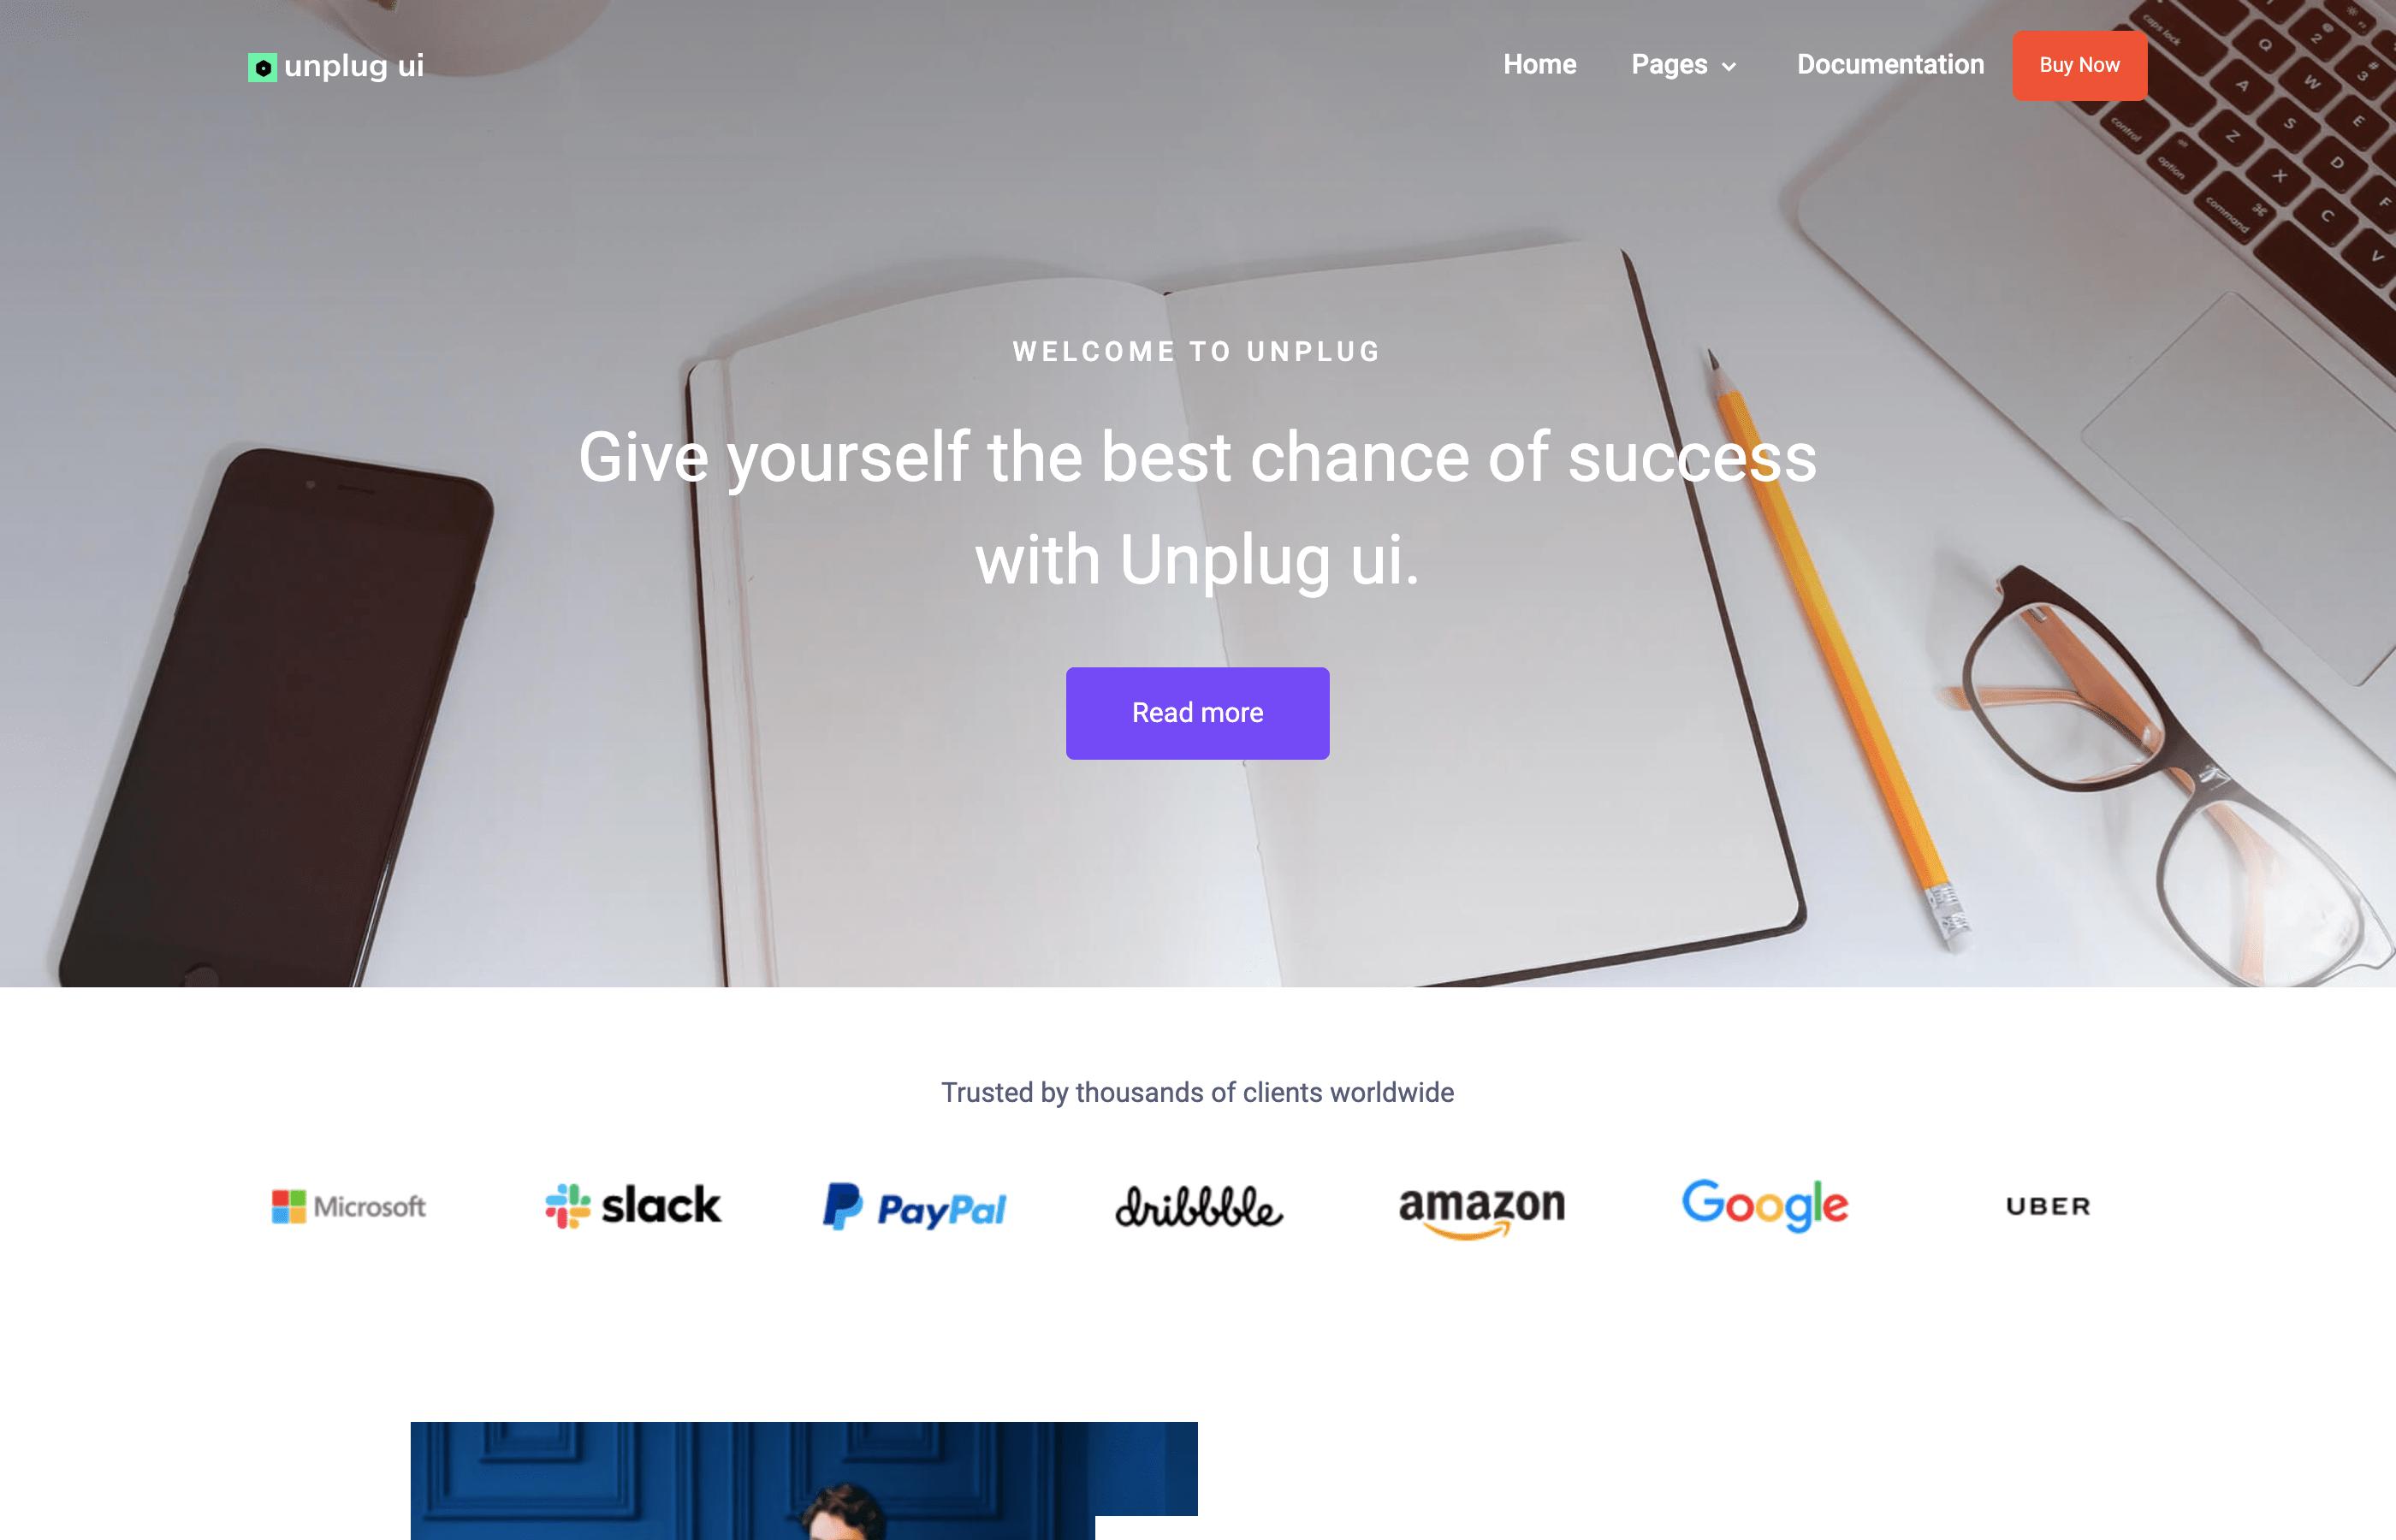 unplug-ui-landing pages